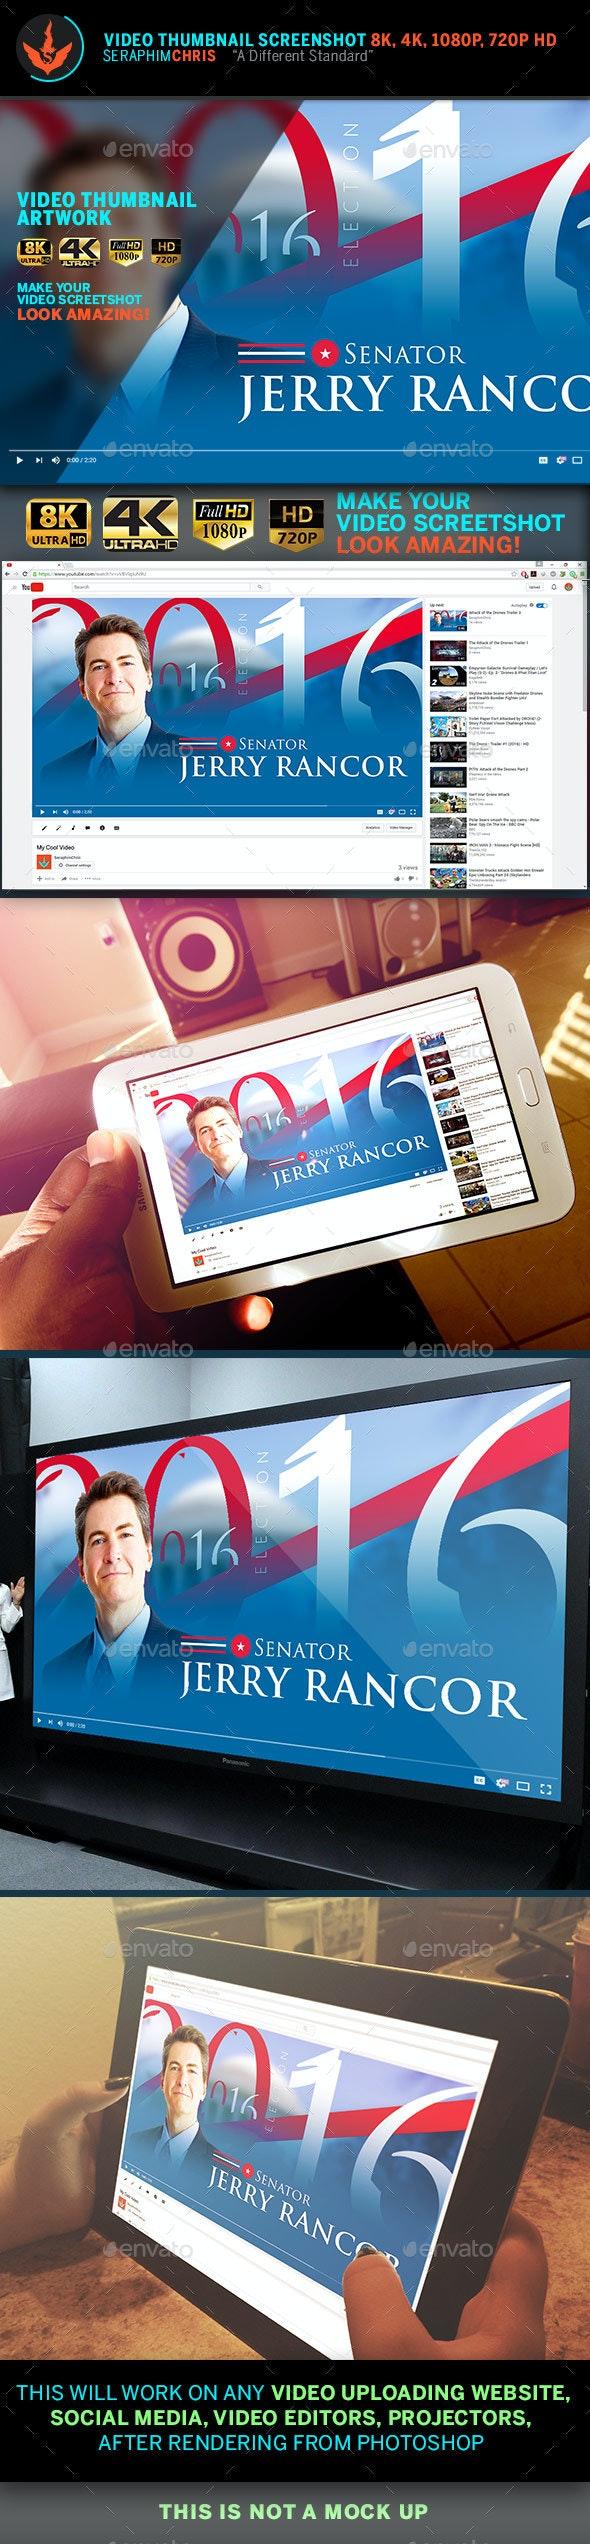 Political YouTube Video Thumbnail Screenshot Template - YouTube Social Media